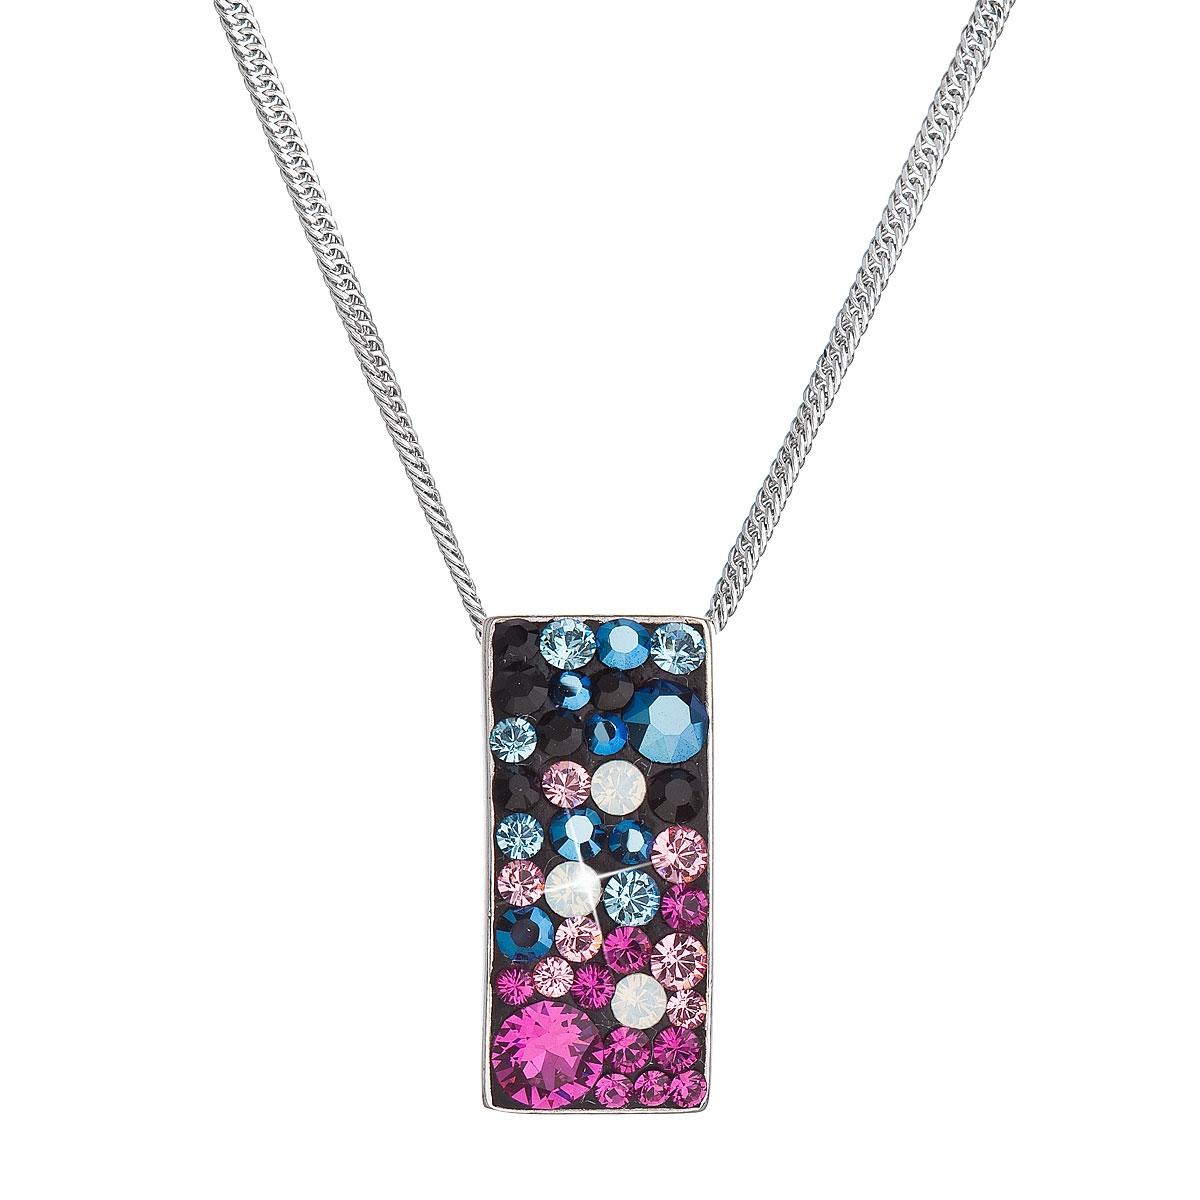 Stříbrný náhrdelník se Swarovski krystaly, Galaxy EG4257-GX